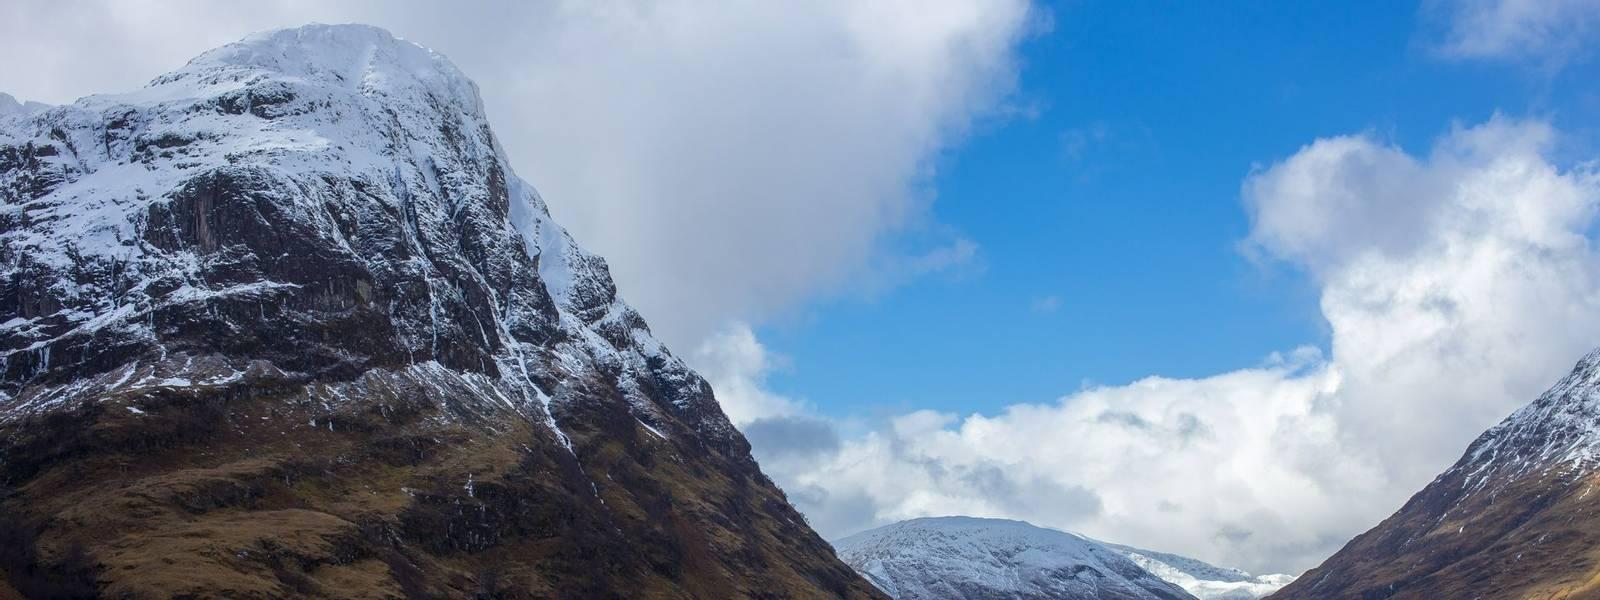 Scottish Highlands - Spring & Winter - AdobeStock_196758608.jpeg